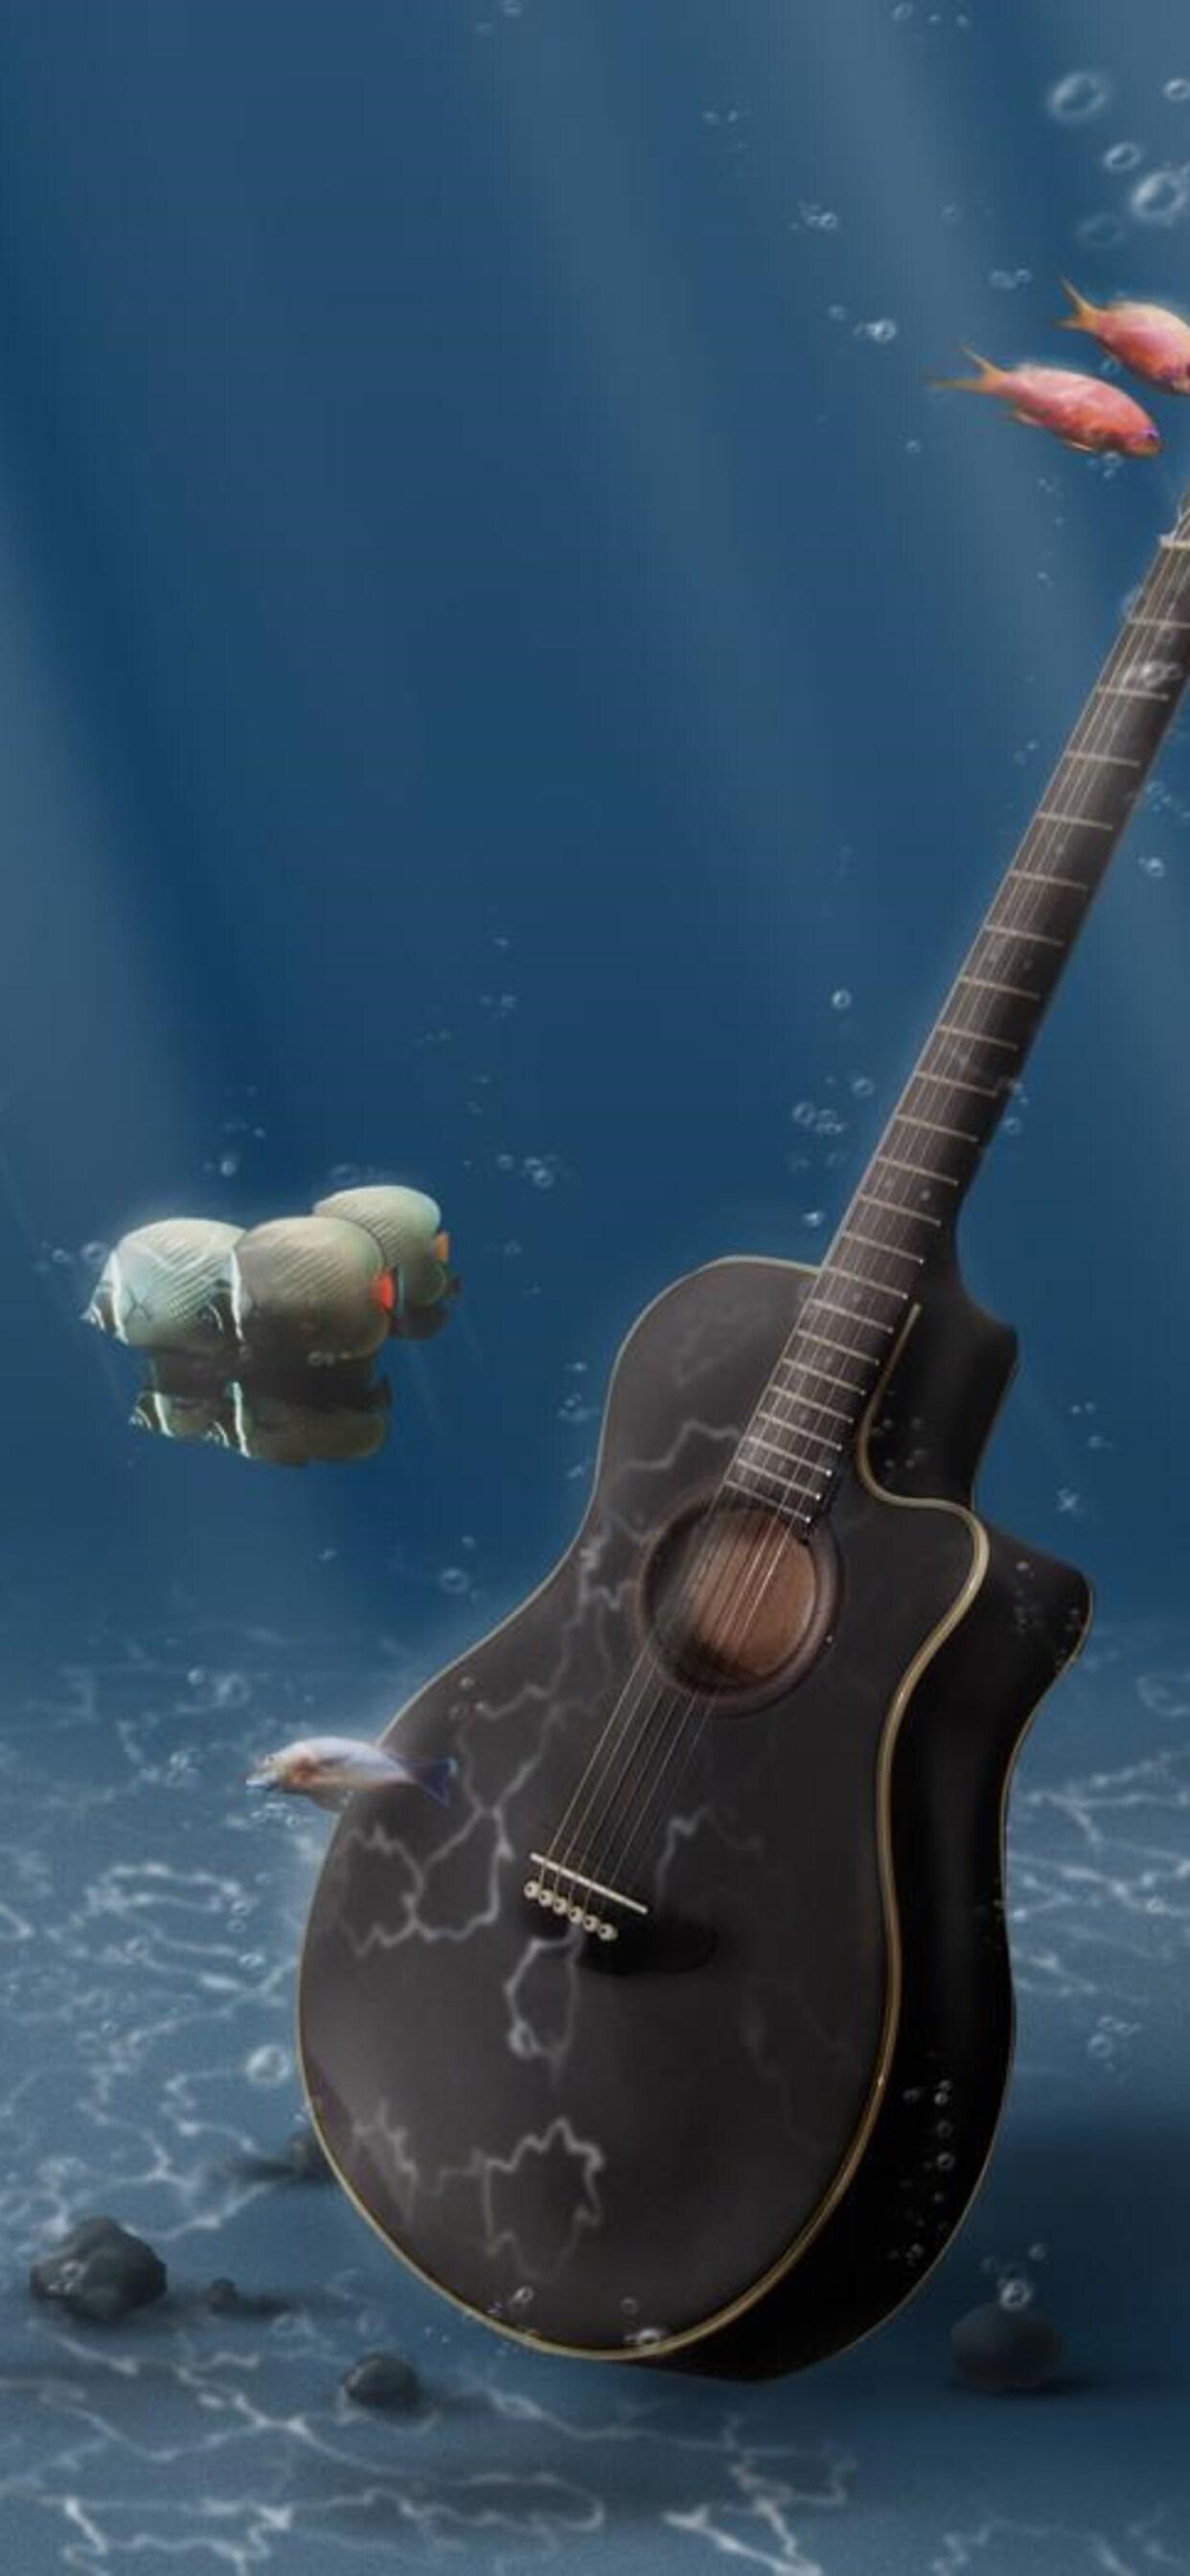 1242x2688 Guitar Digital Art Iphone Xs Max Hd 4k Wallpapers